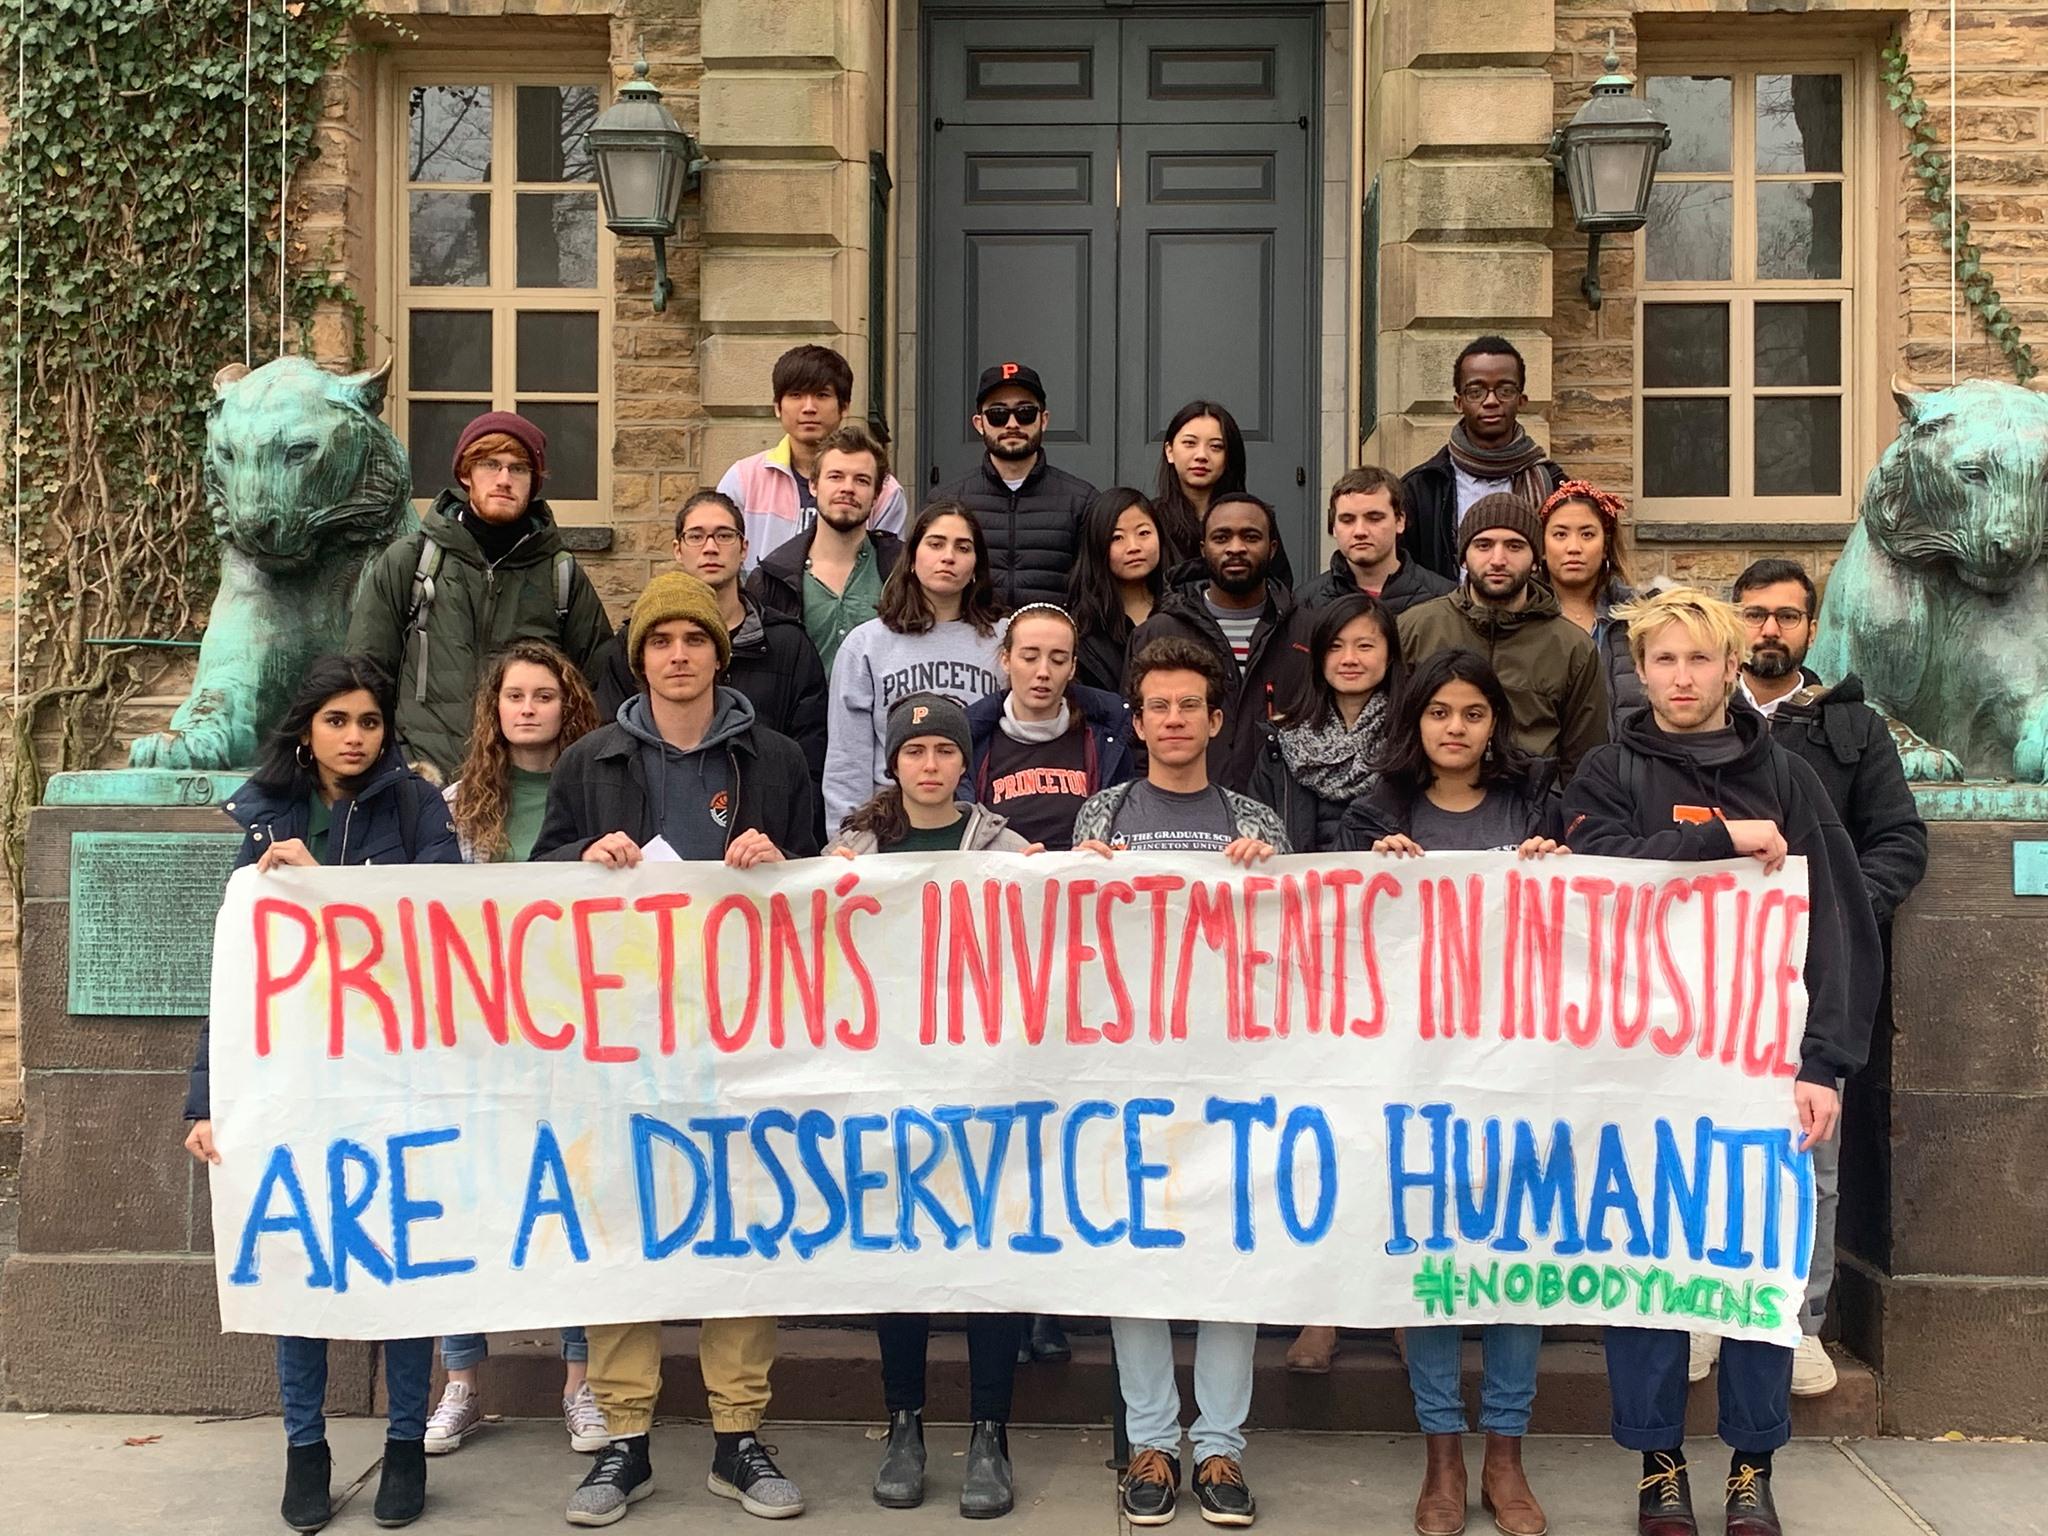 Divest Princeton